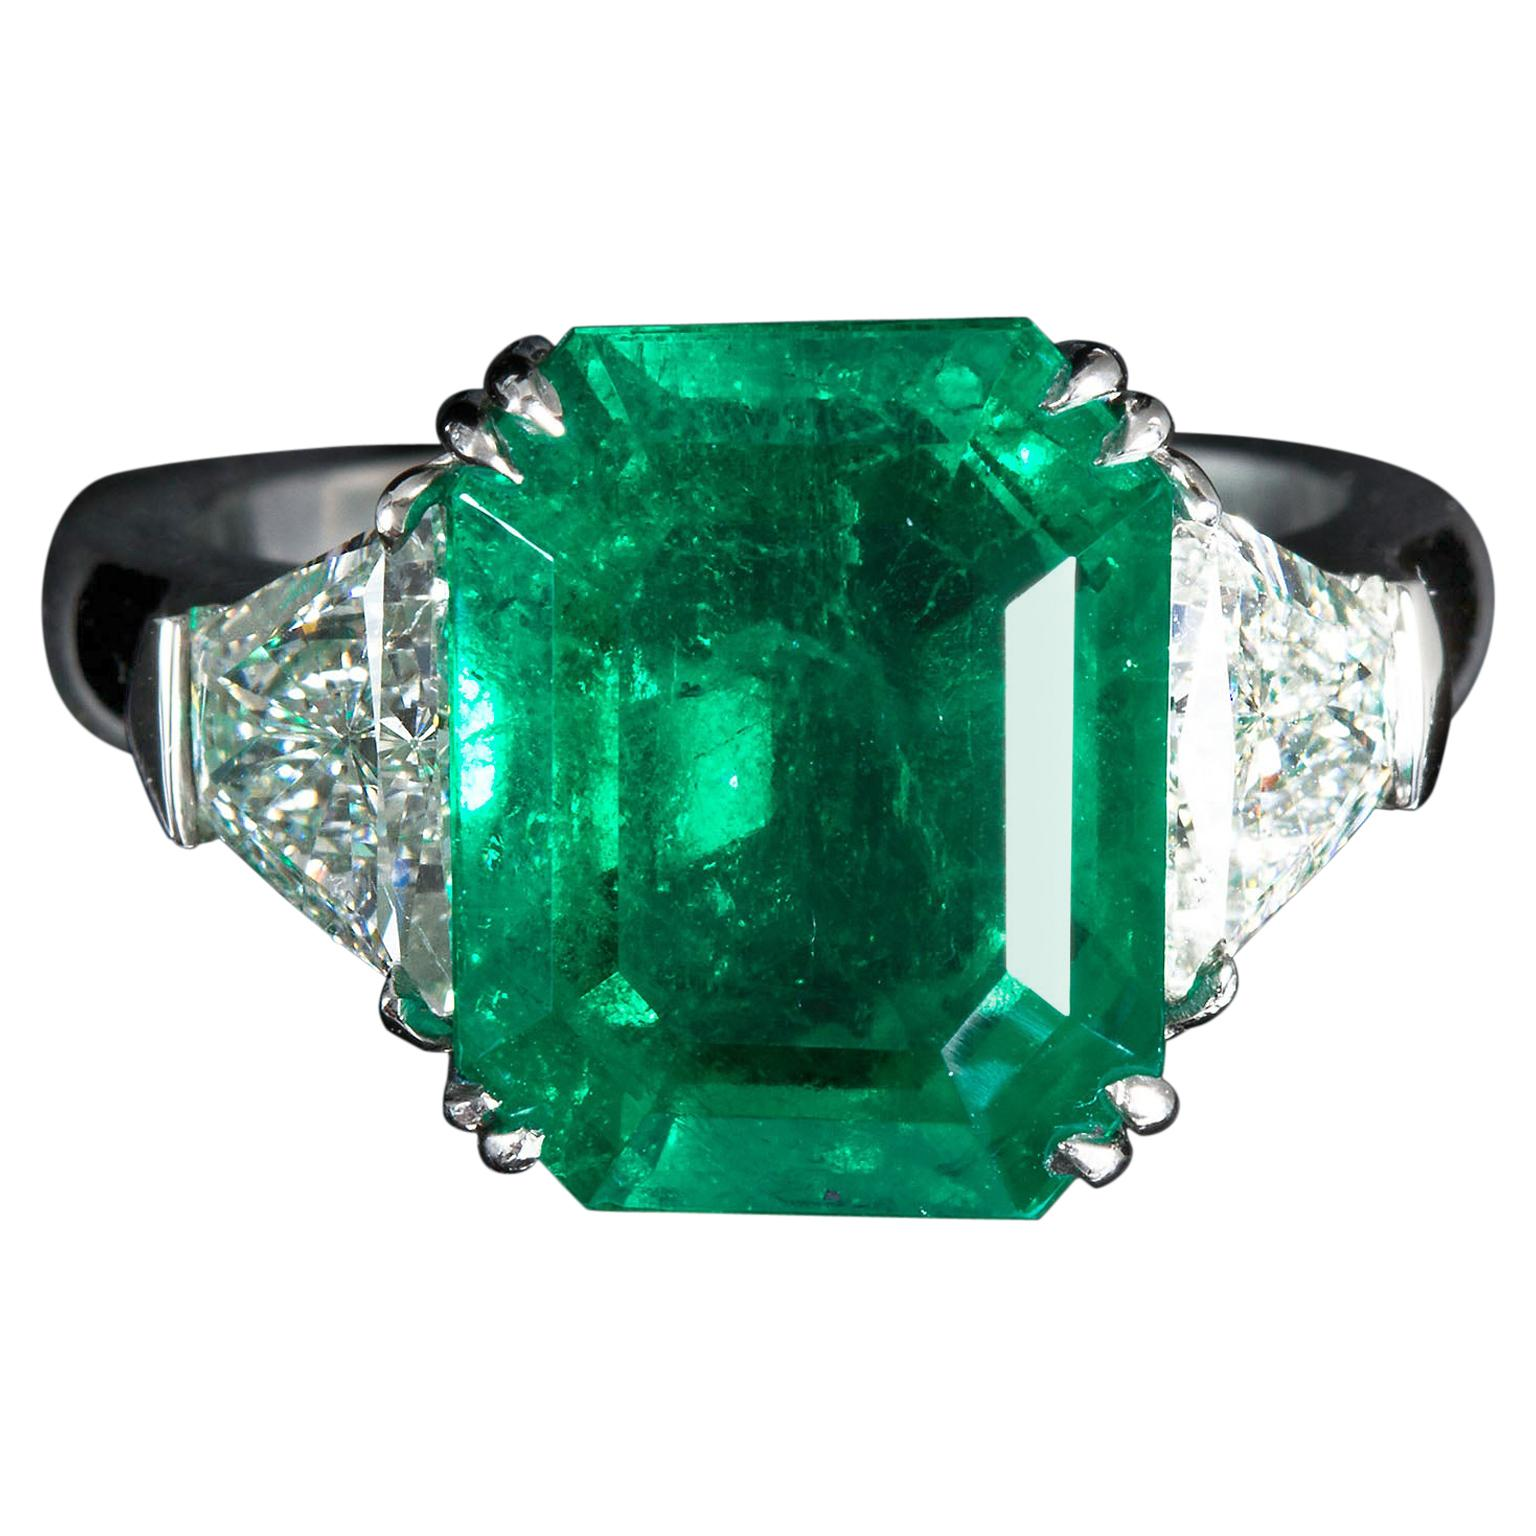 7 Carat Colombian Emerald Diamond Engagement Ring